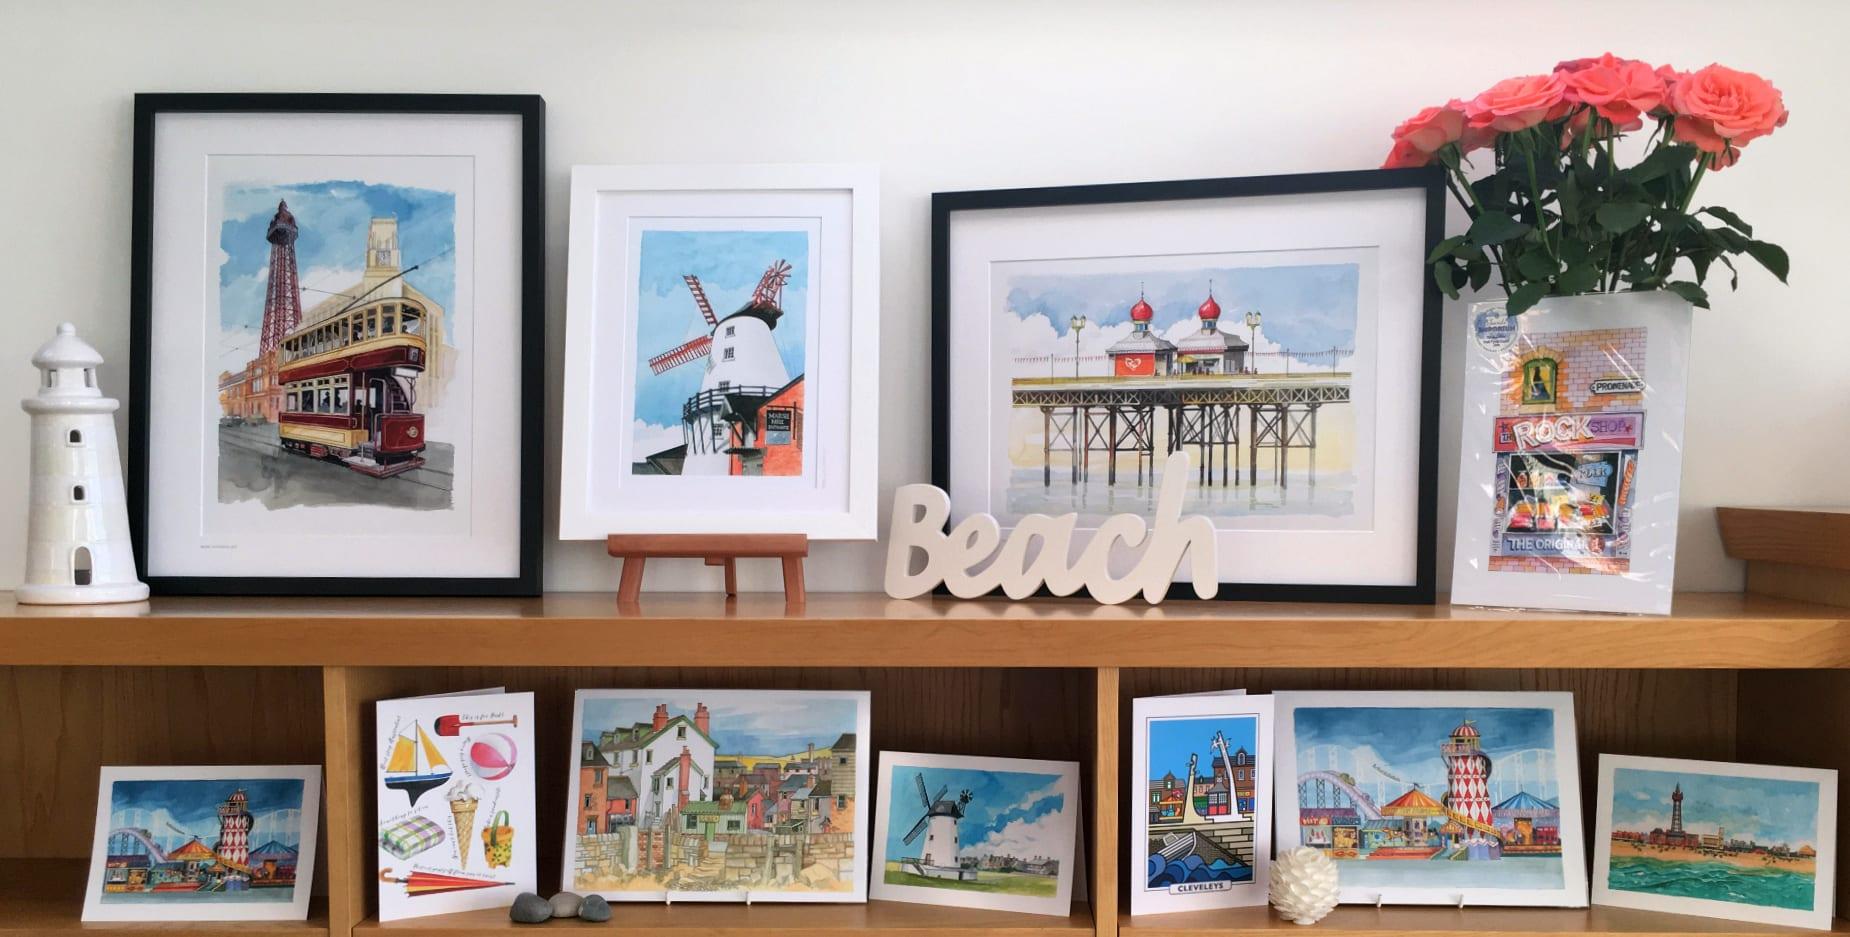 Paintings from Seaside Emporium